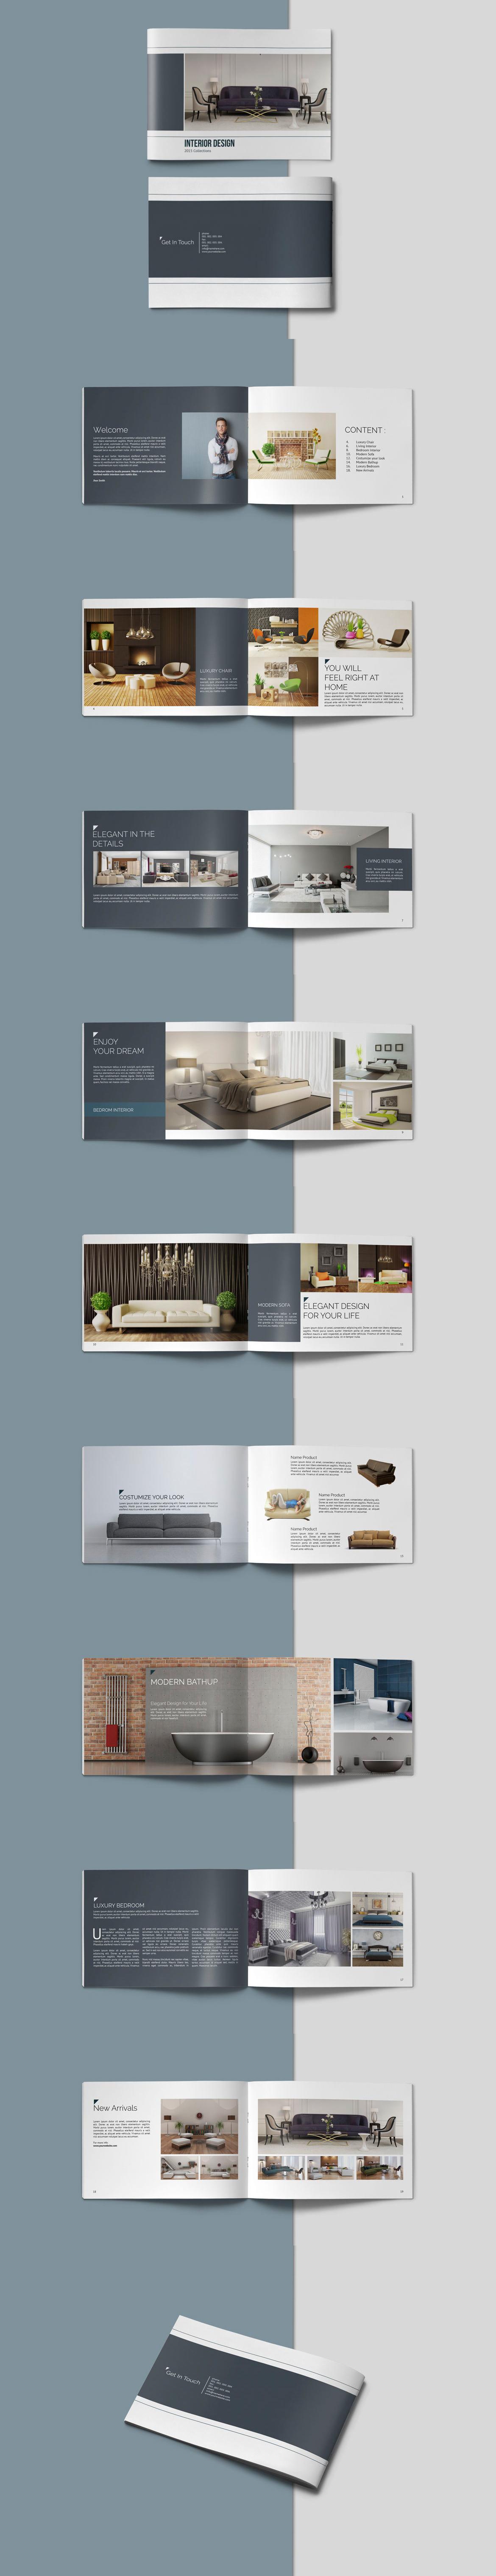 Portfolio Brochure Catalogs Template PSD, INDD - 20 Pages | Brochure ...